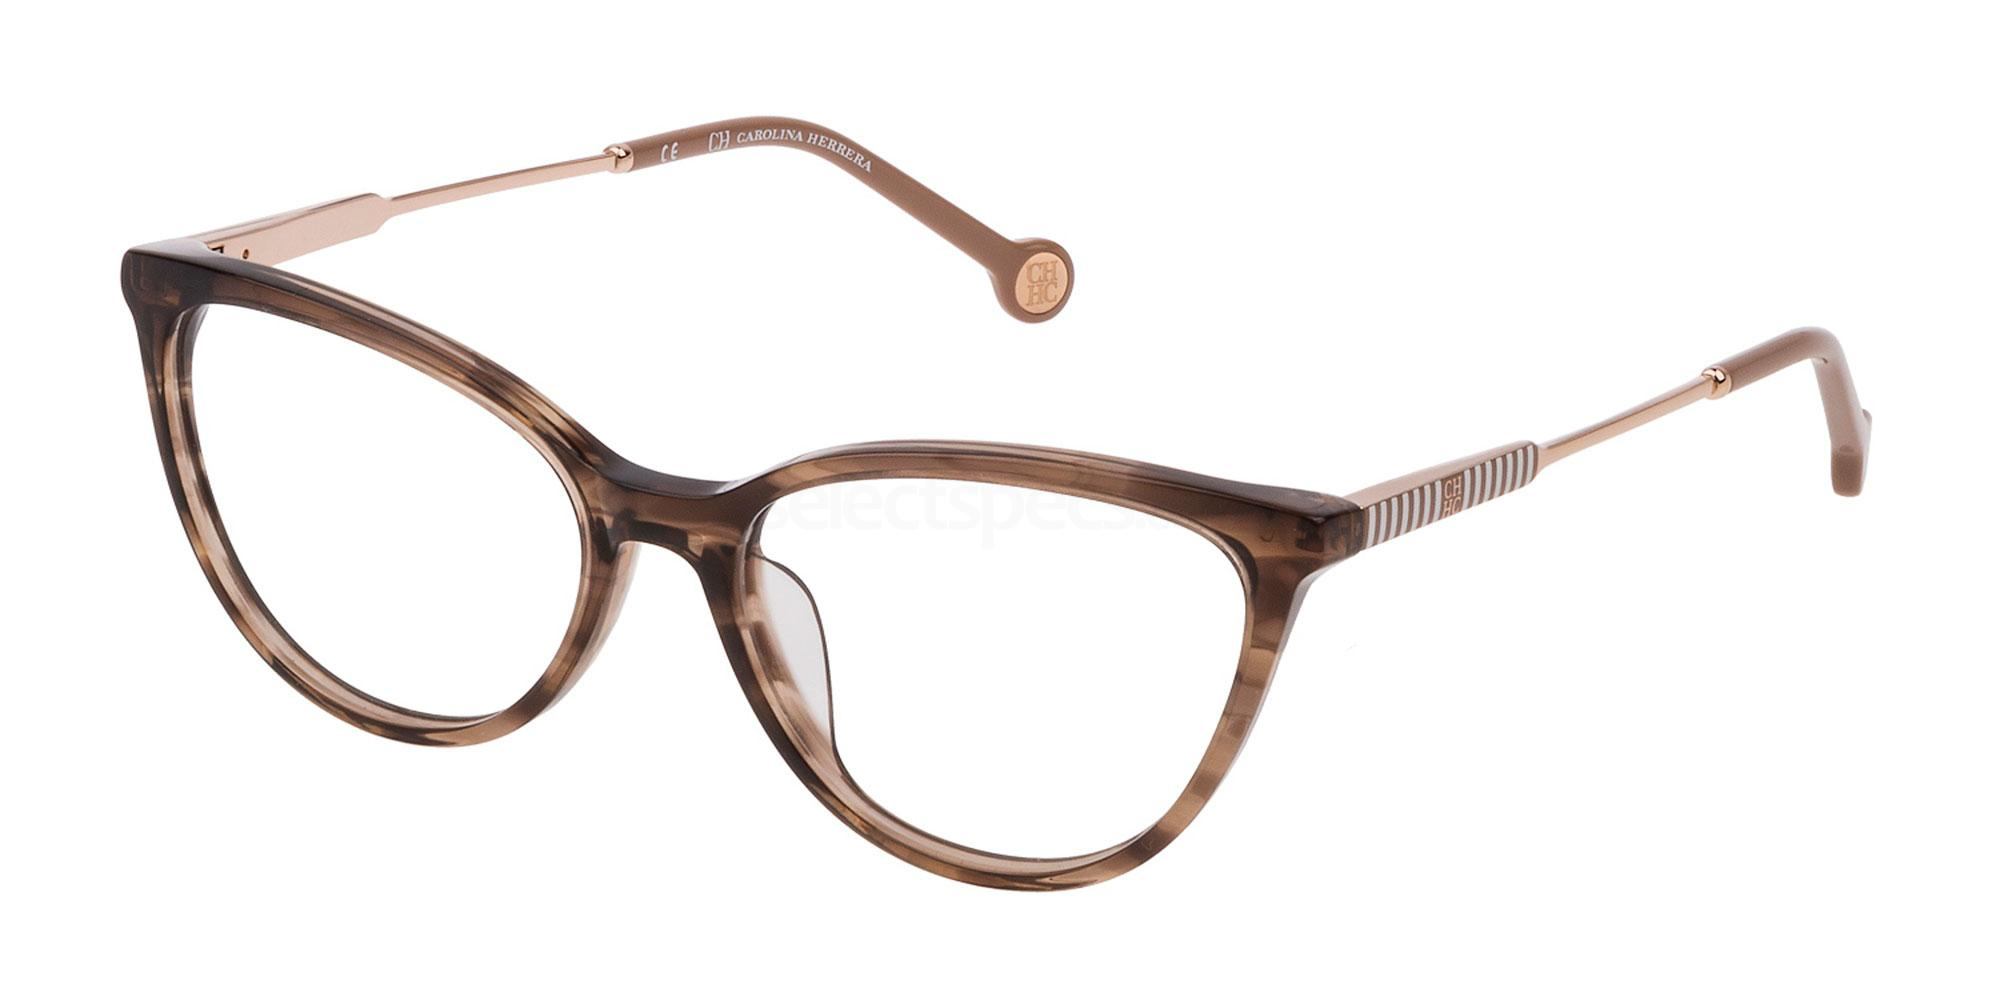 06YH VHE817 Glasses, CH Carolina Herrera